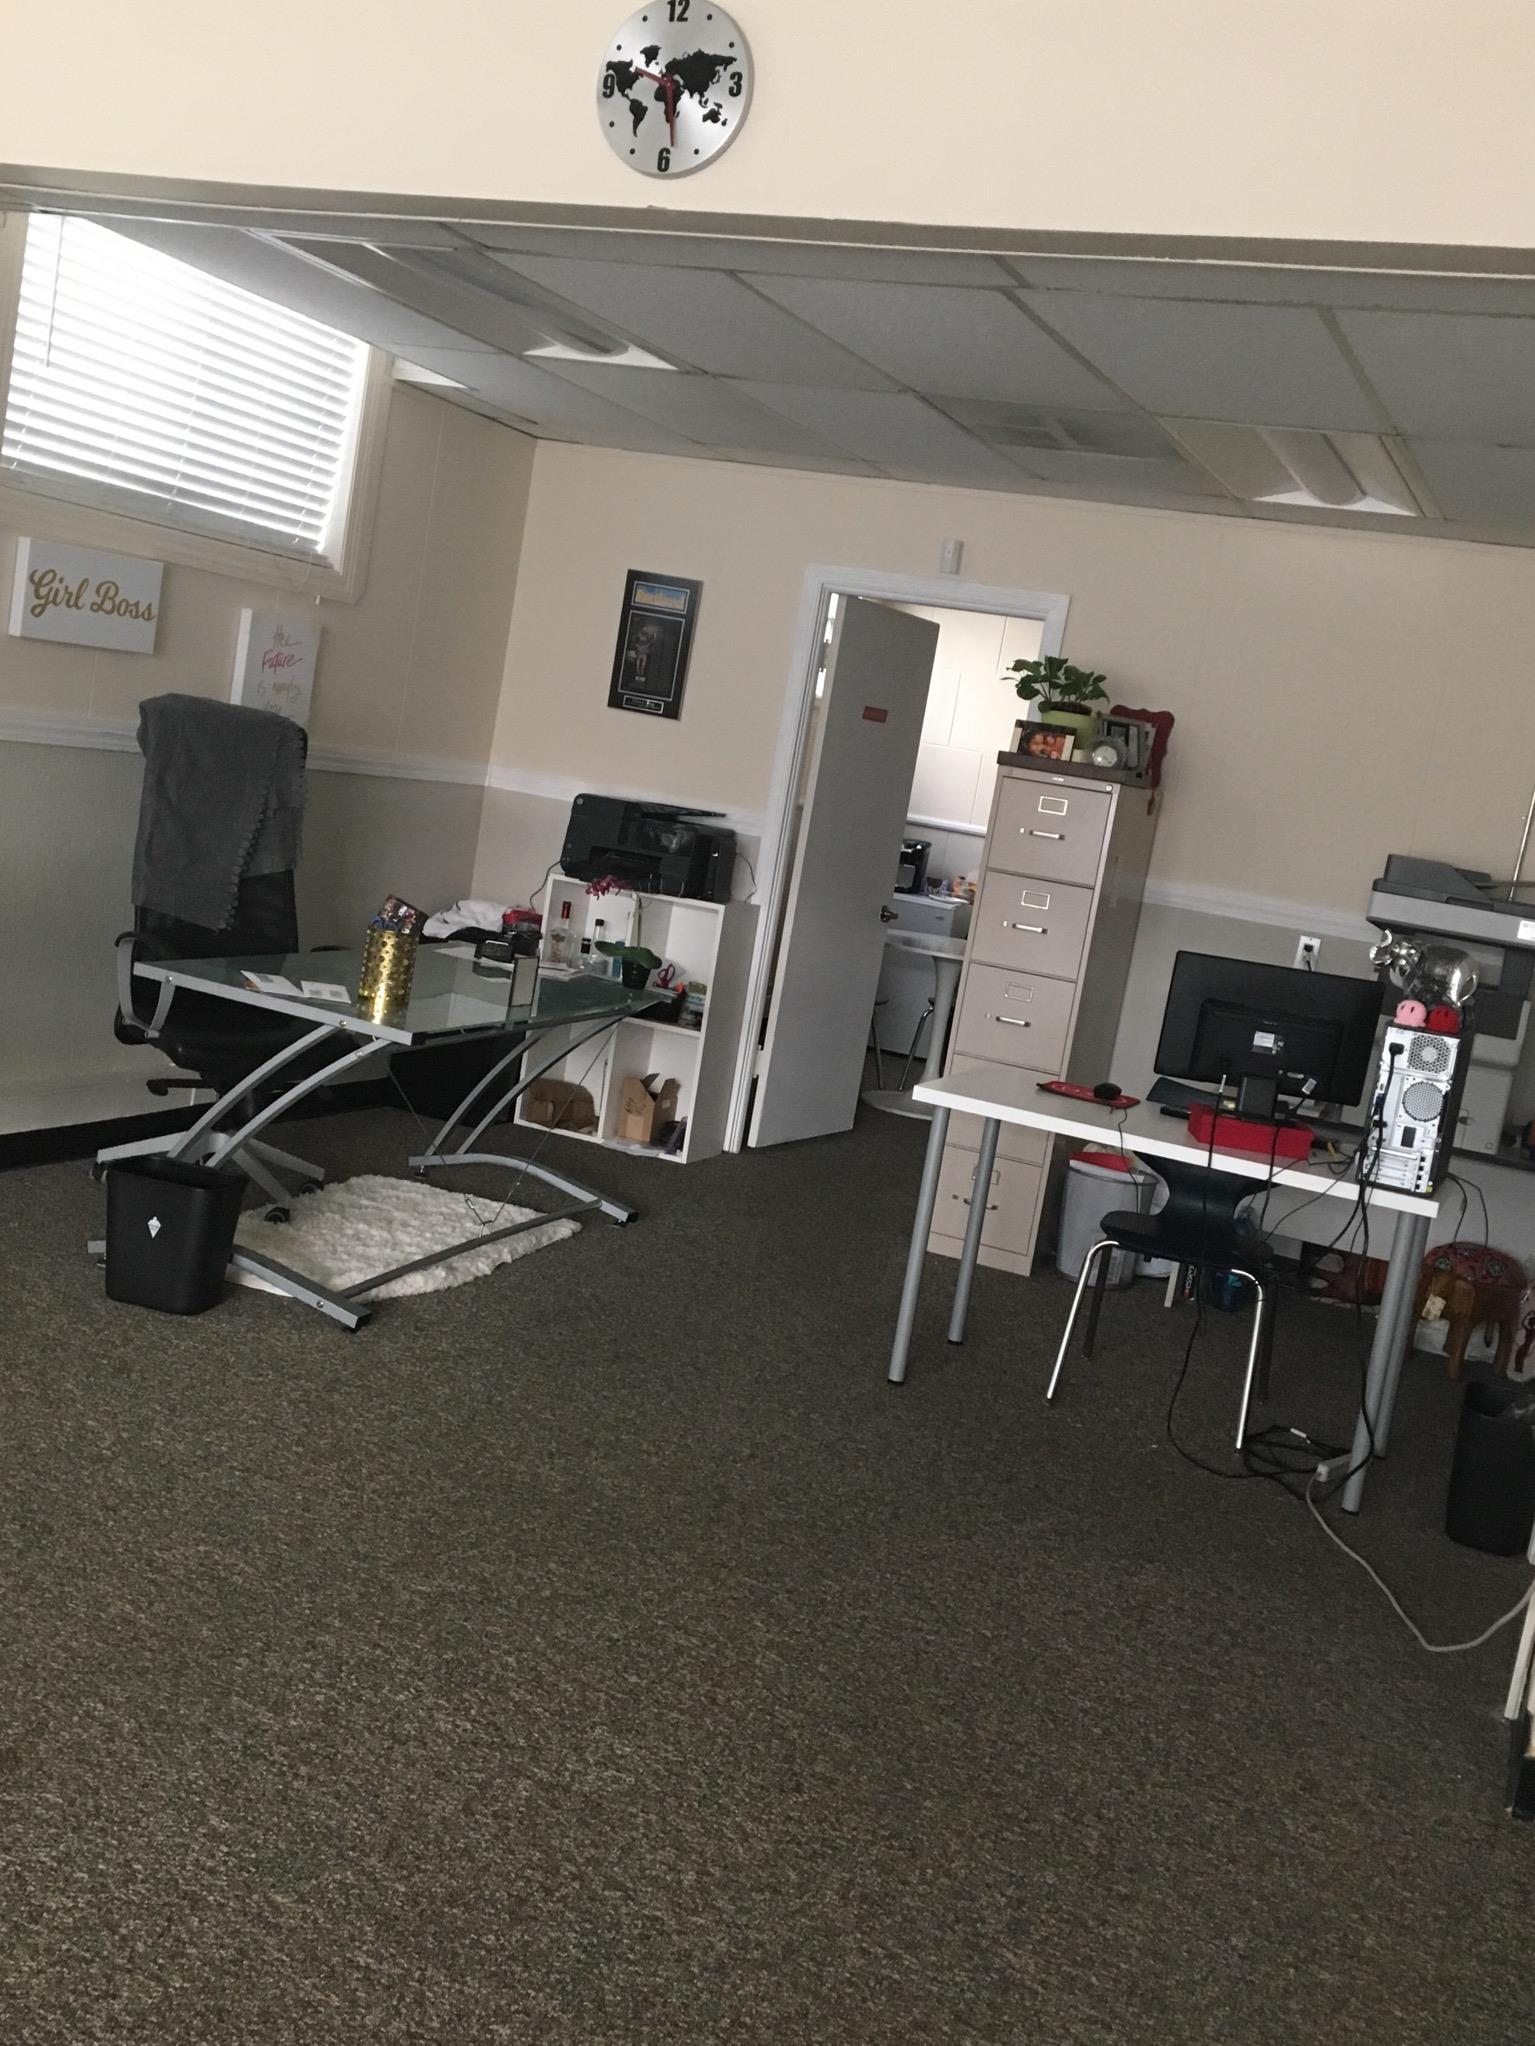 HotSpot Co-Working Space - Dedicated Desk